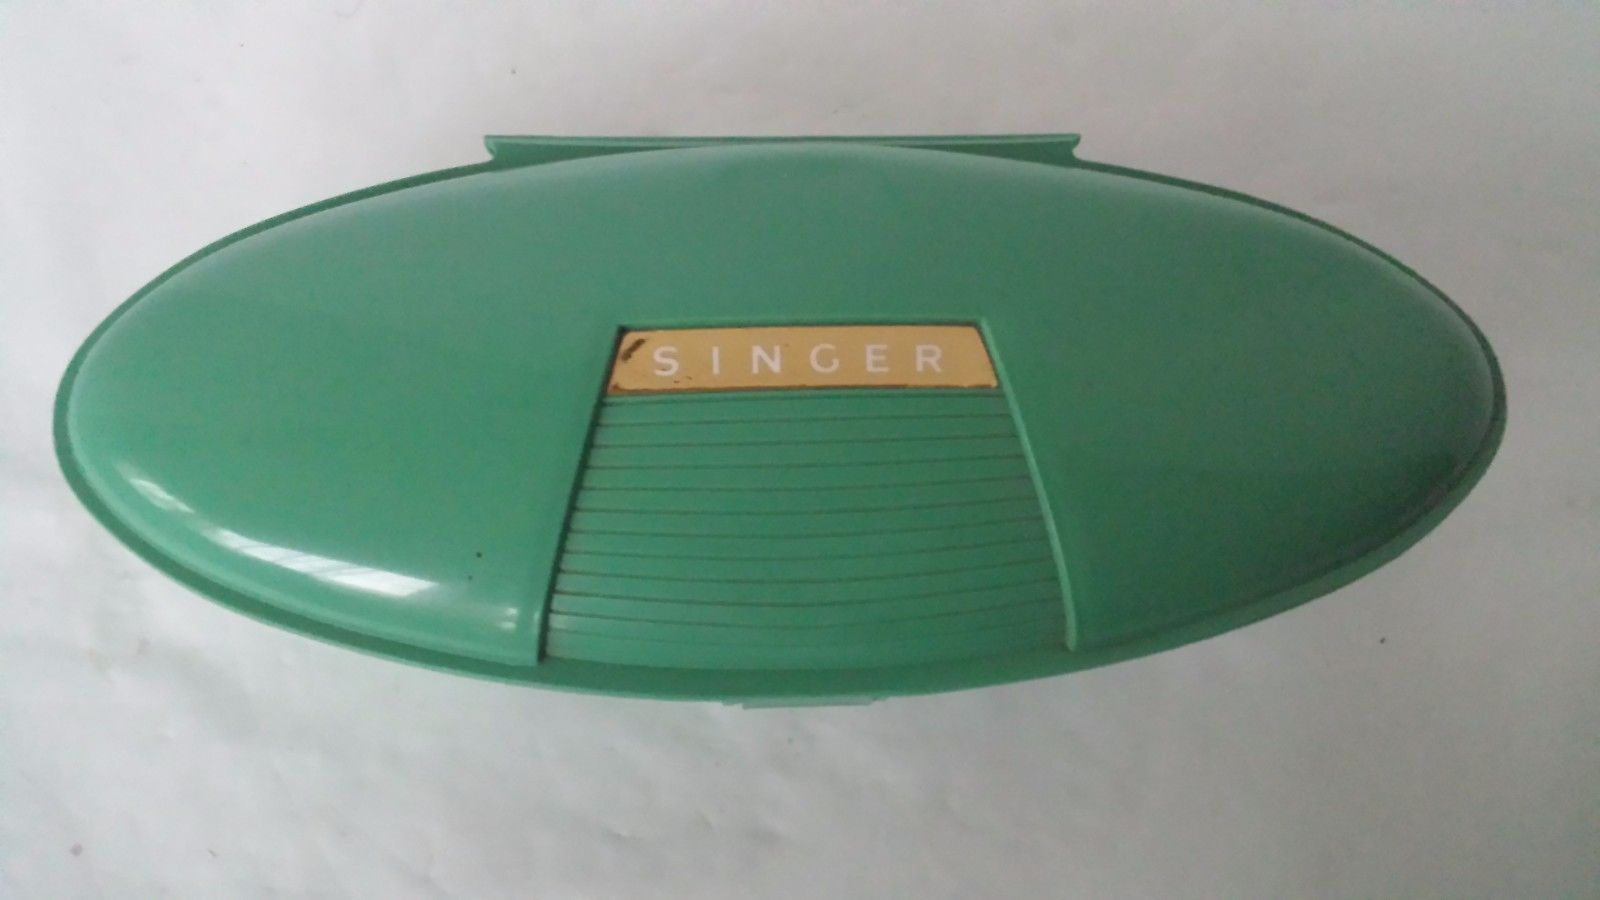 Vintage 1960 Singer Buttonholer With Instructions - $34.03